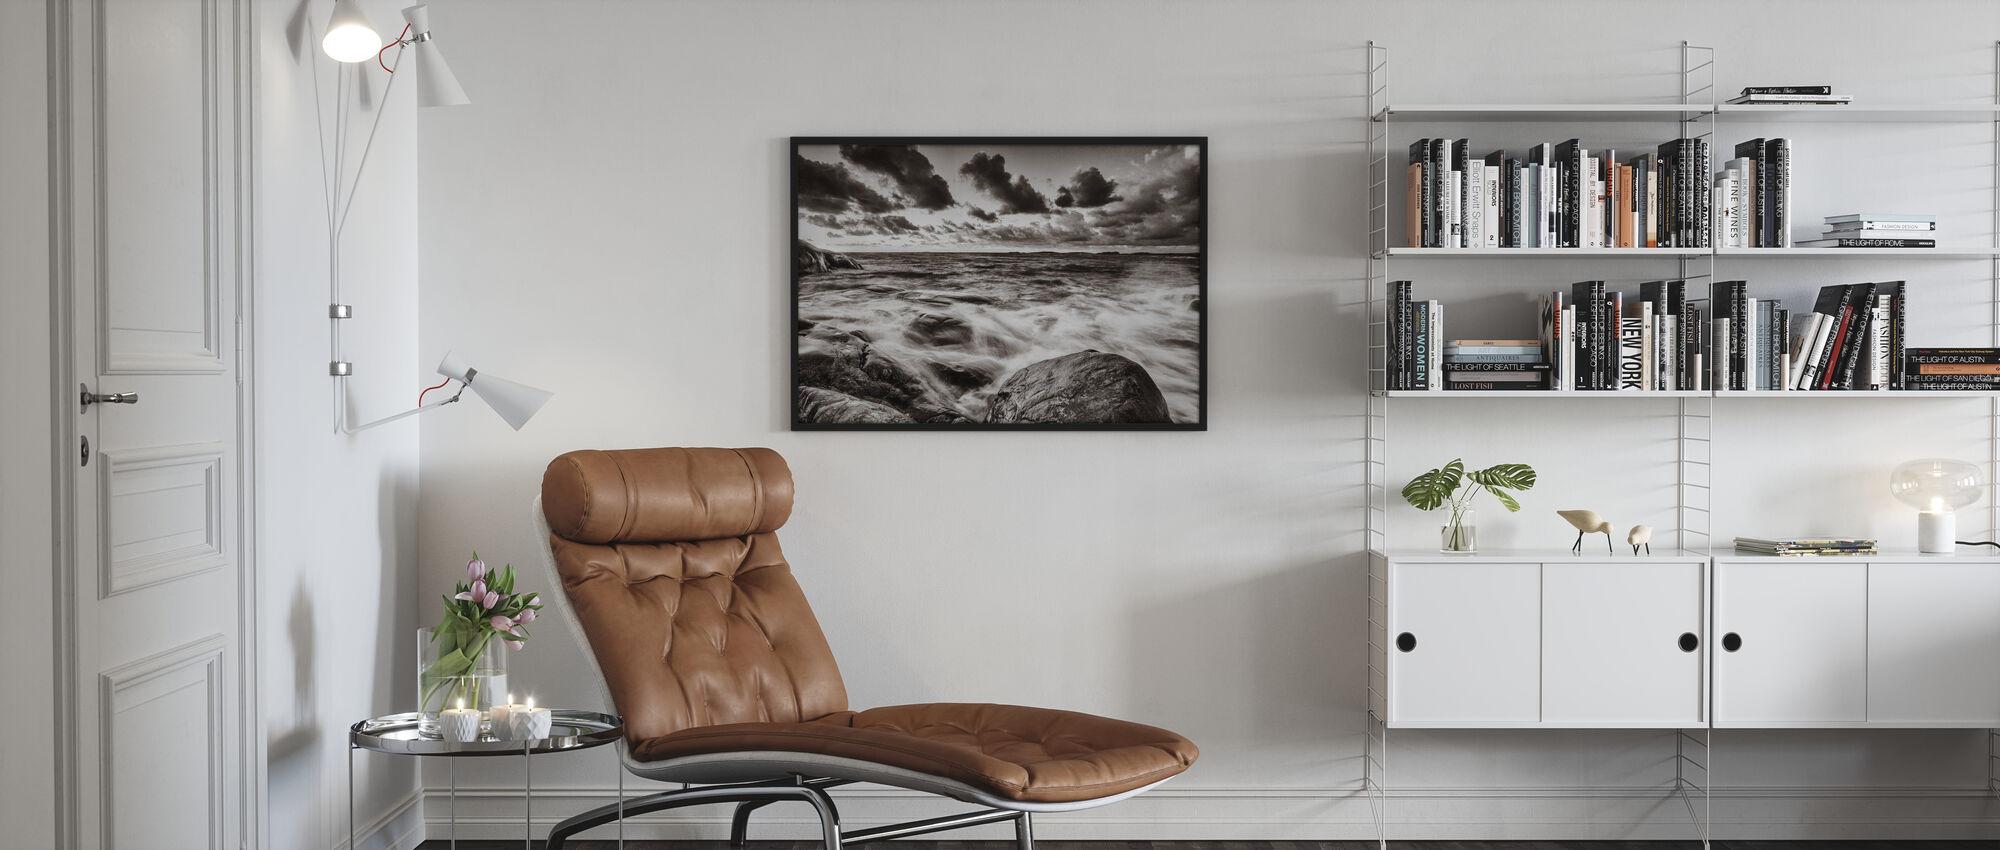 Stormy Sea at Rocks - Framed print - Living Room